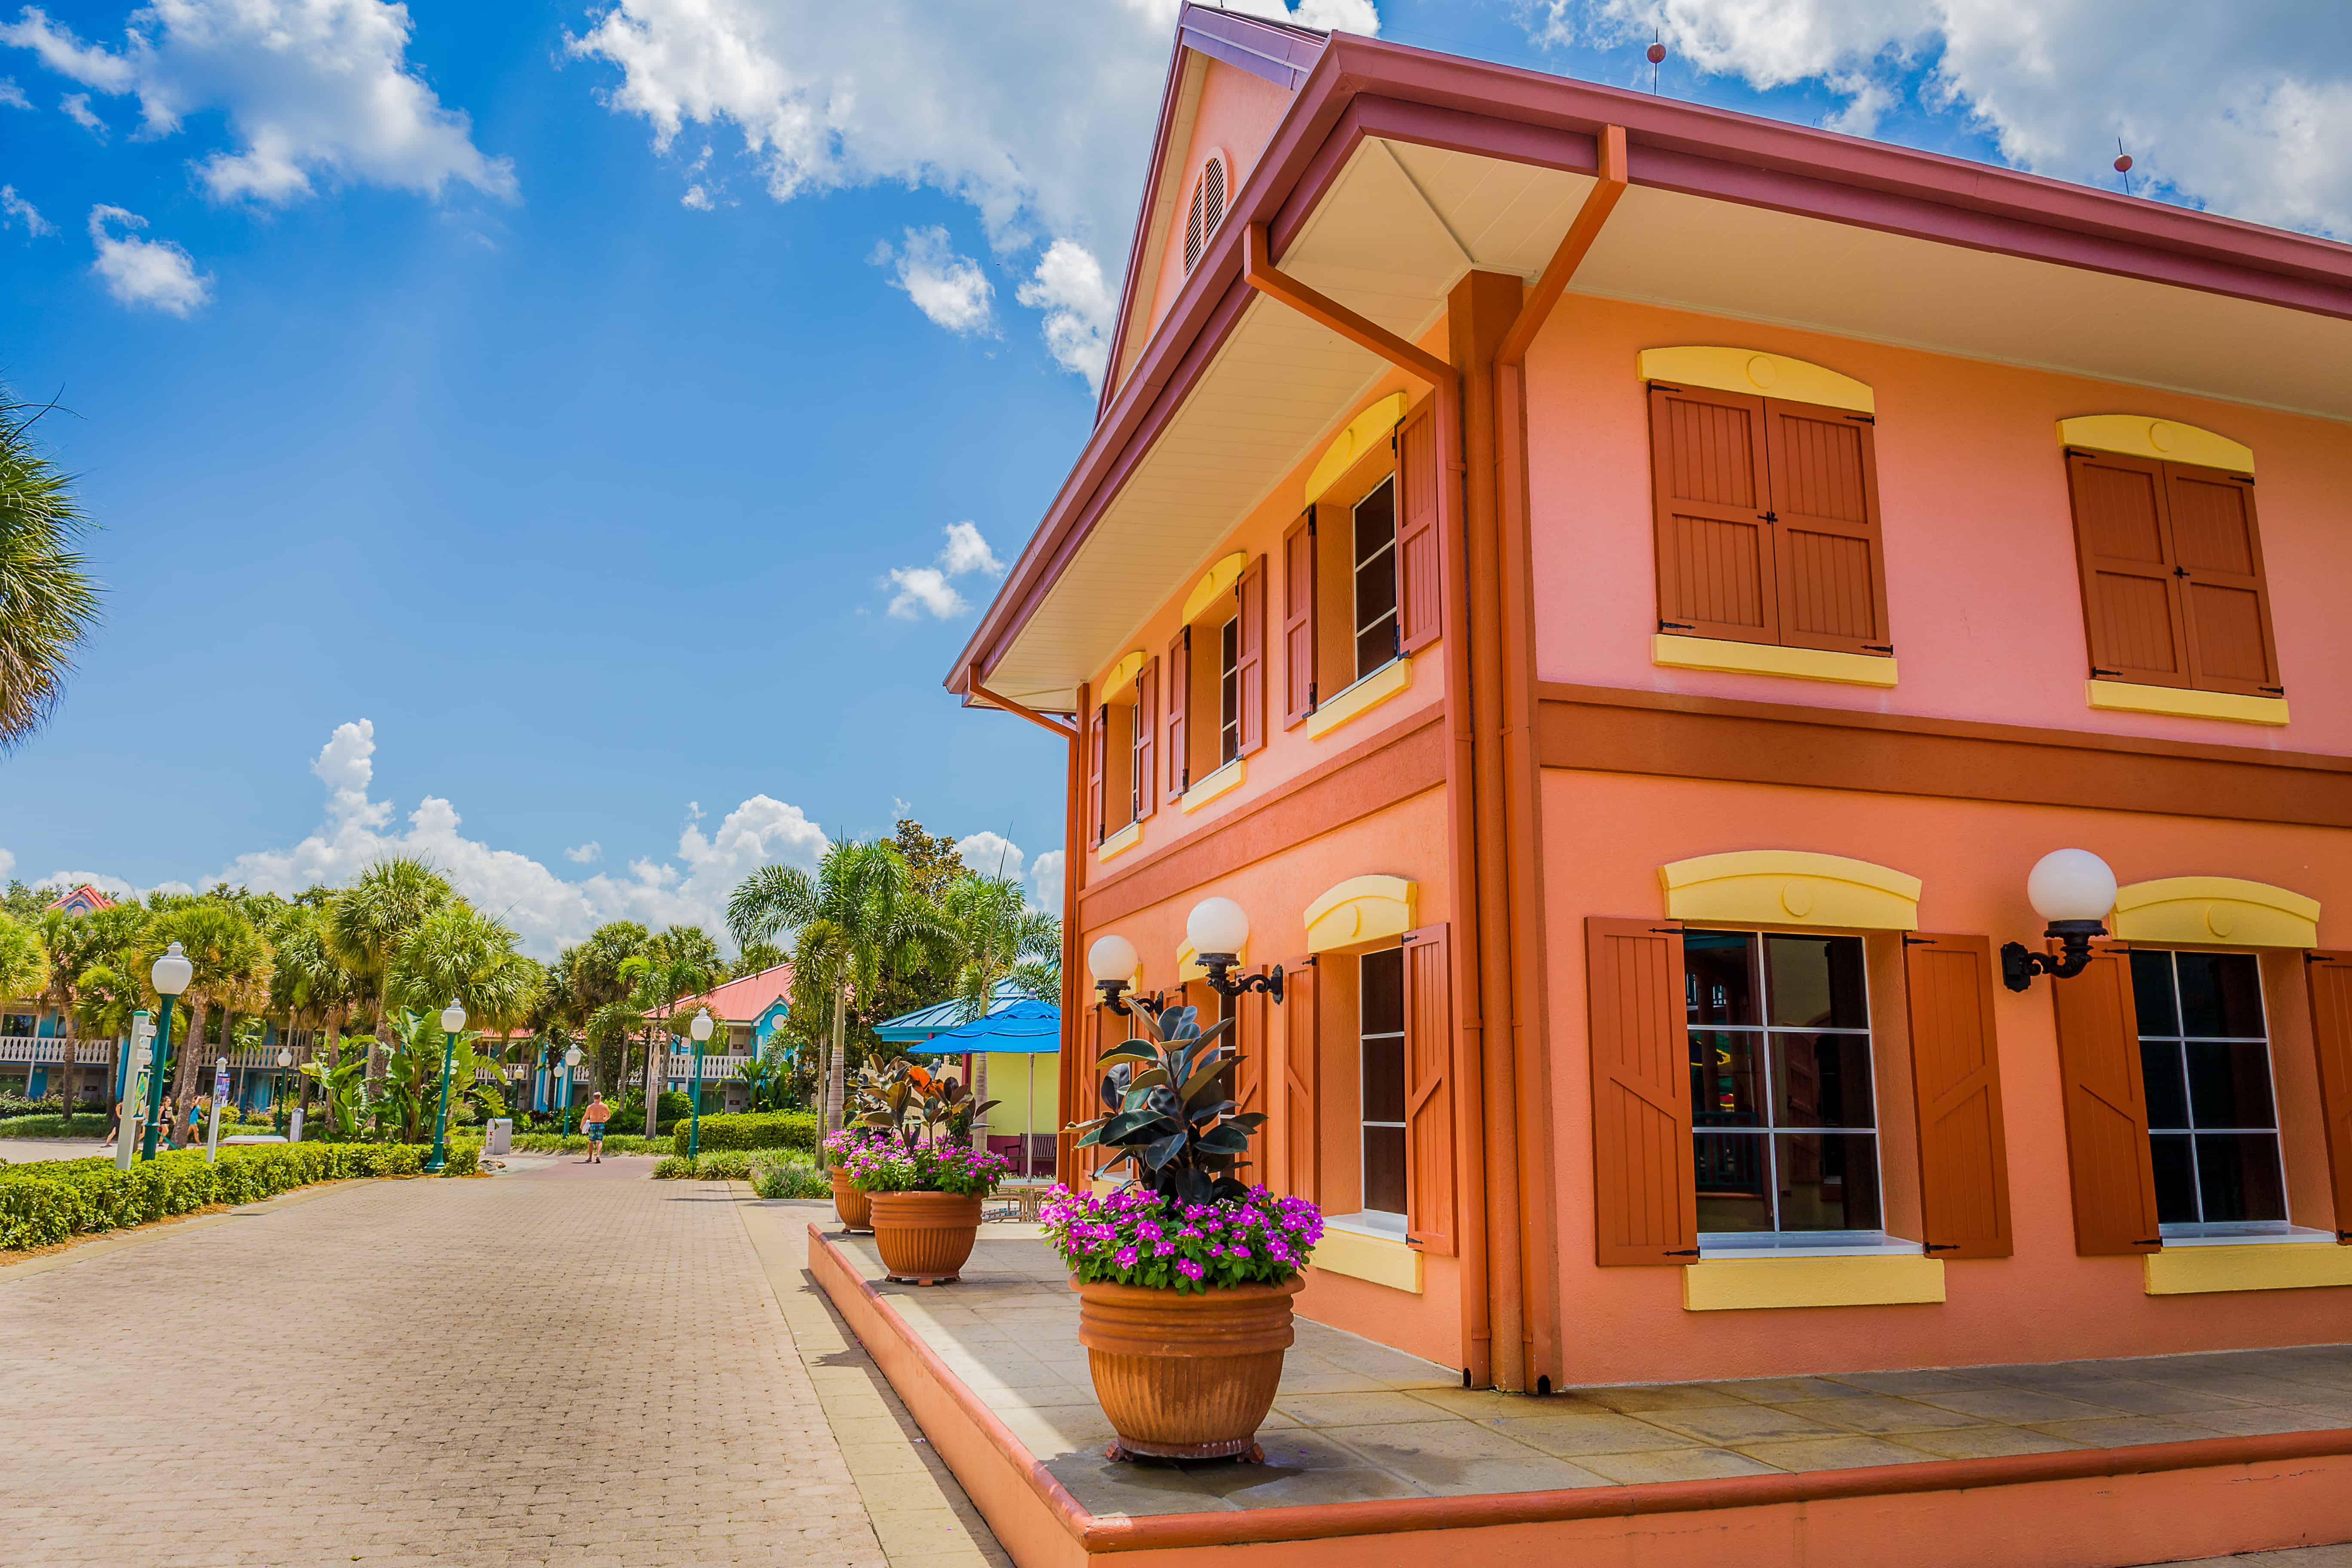 Bright Building Florida Mark Johnstone Photography & Design